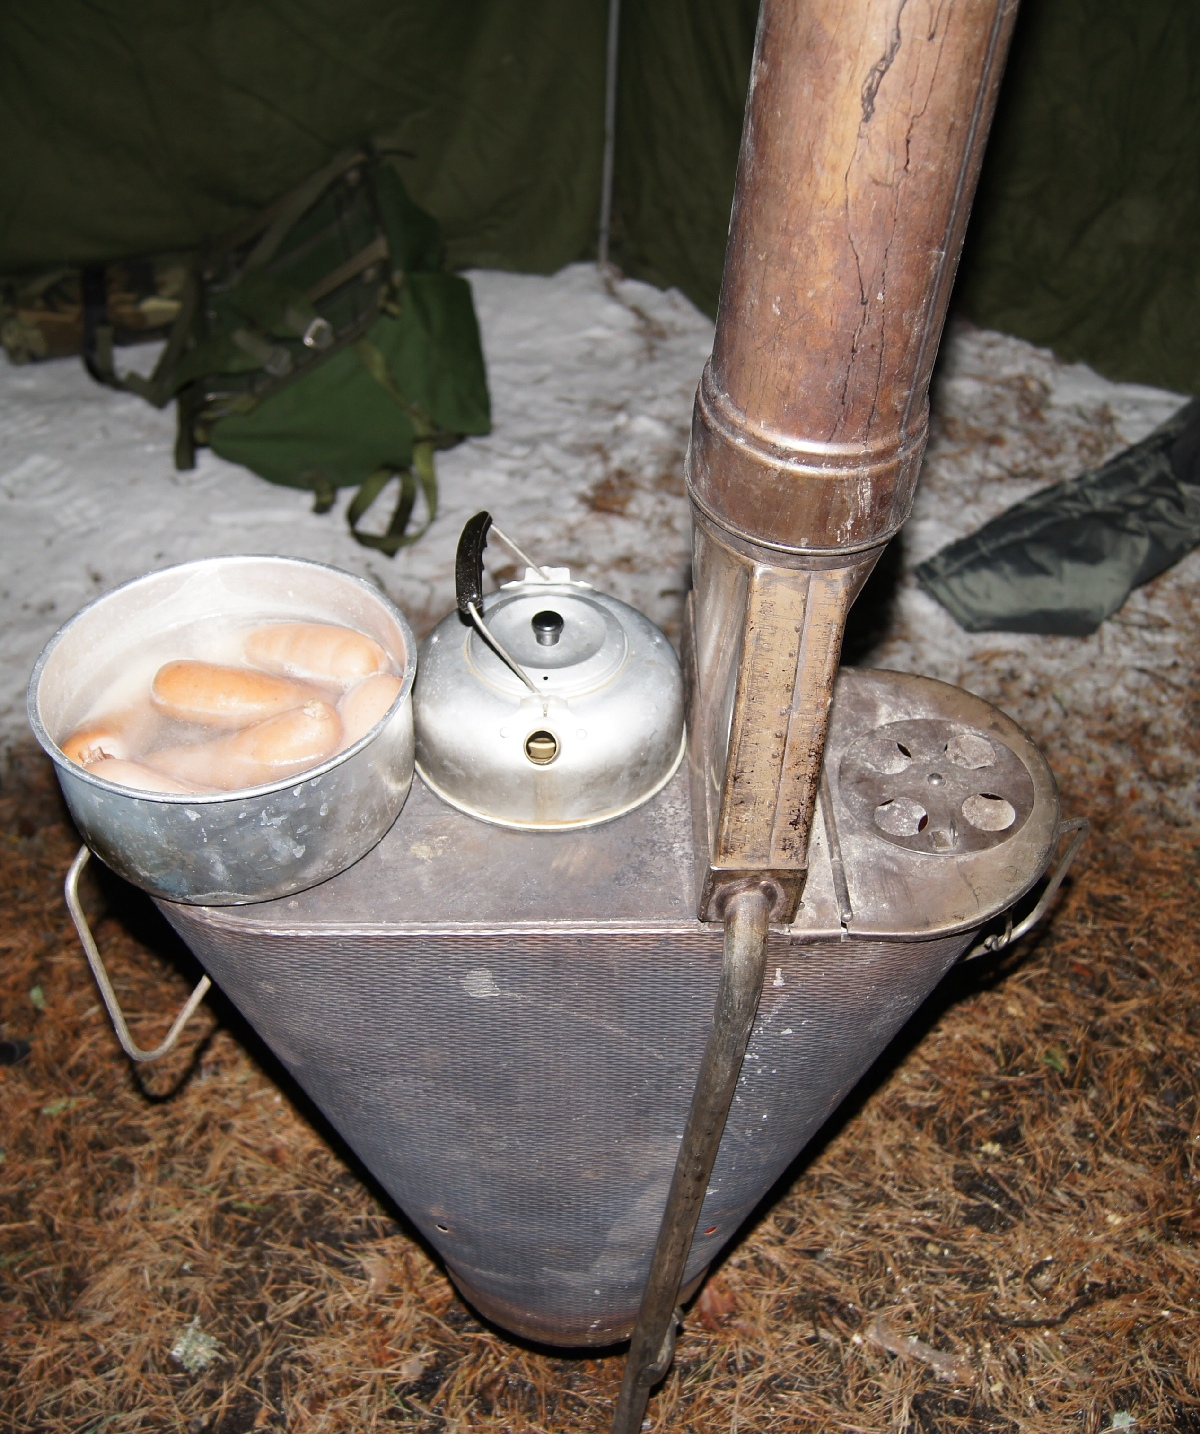 Stove inside swedish army tent. Matsirand. Holiday in Estonia Matsi beach on winter & NN44. Stove inside swedish army tent. Matsi beach on winter ...